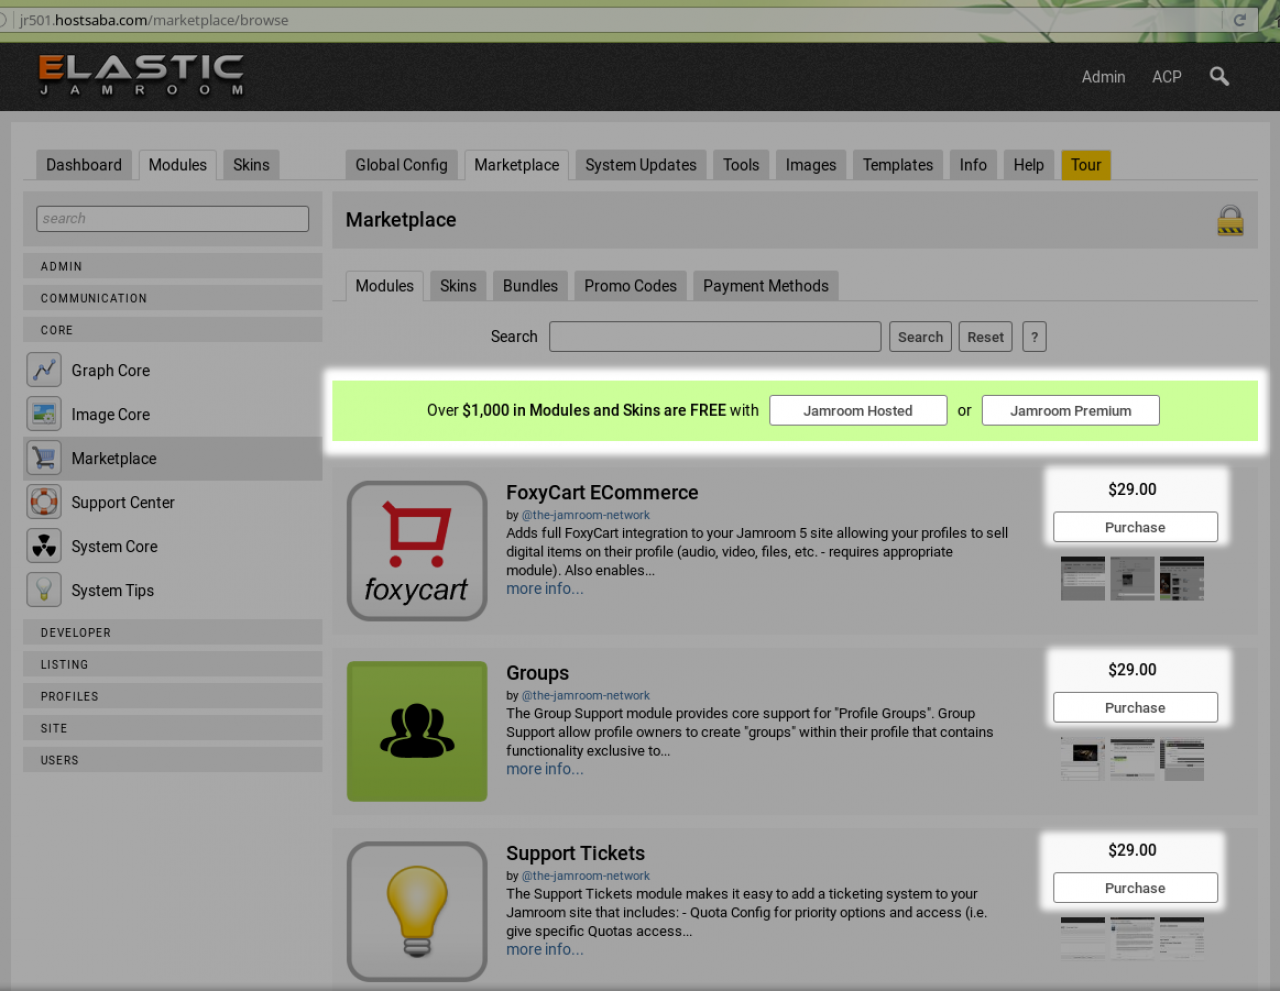 (screenshot of the marketplace without Jamroom Premium)